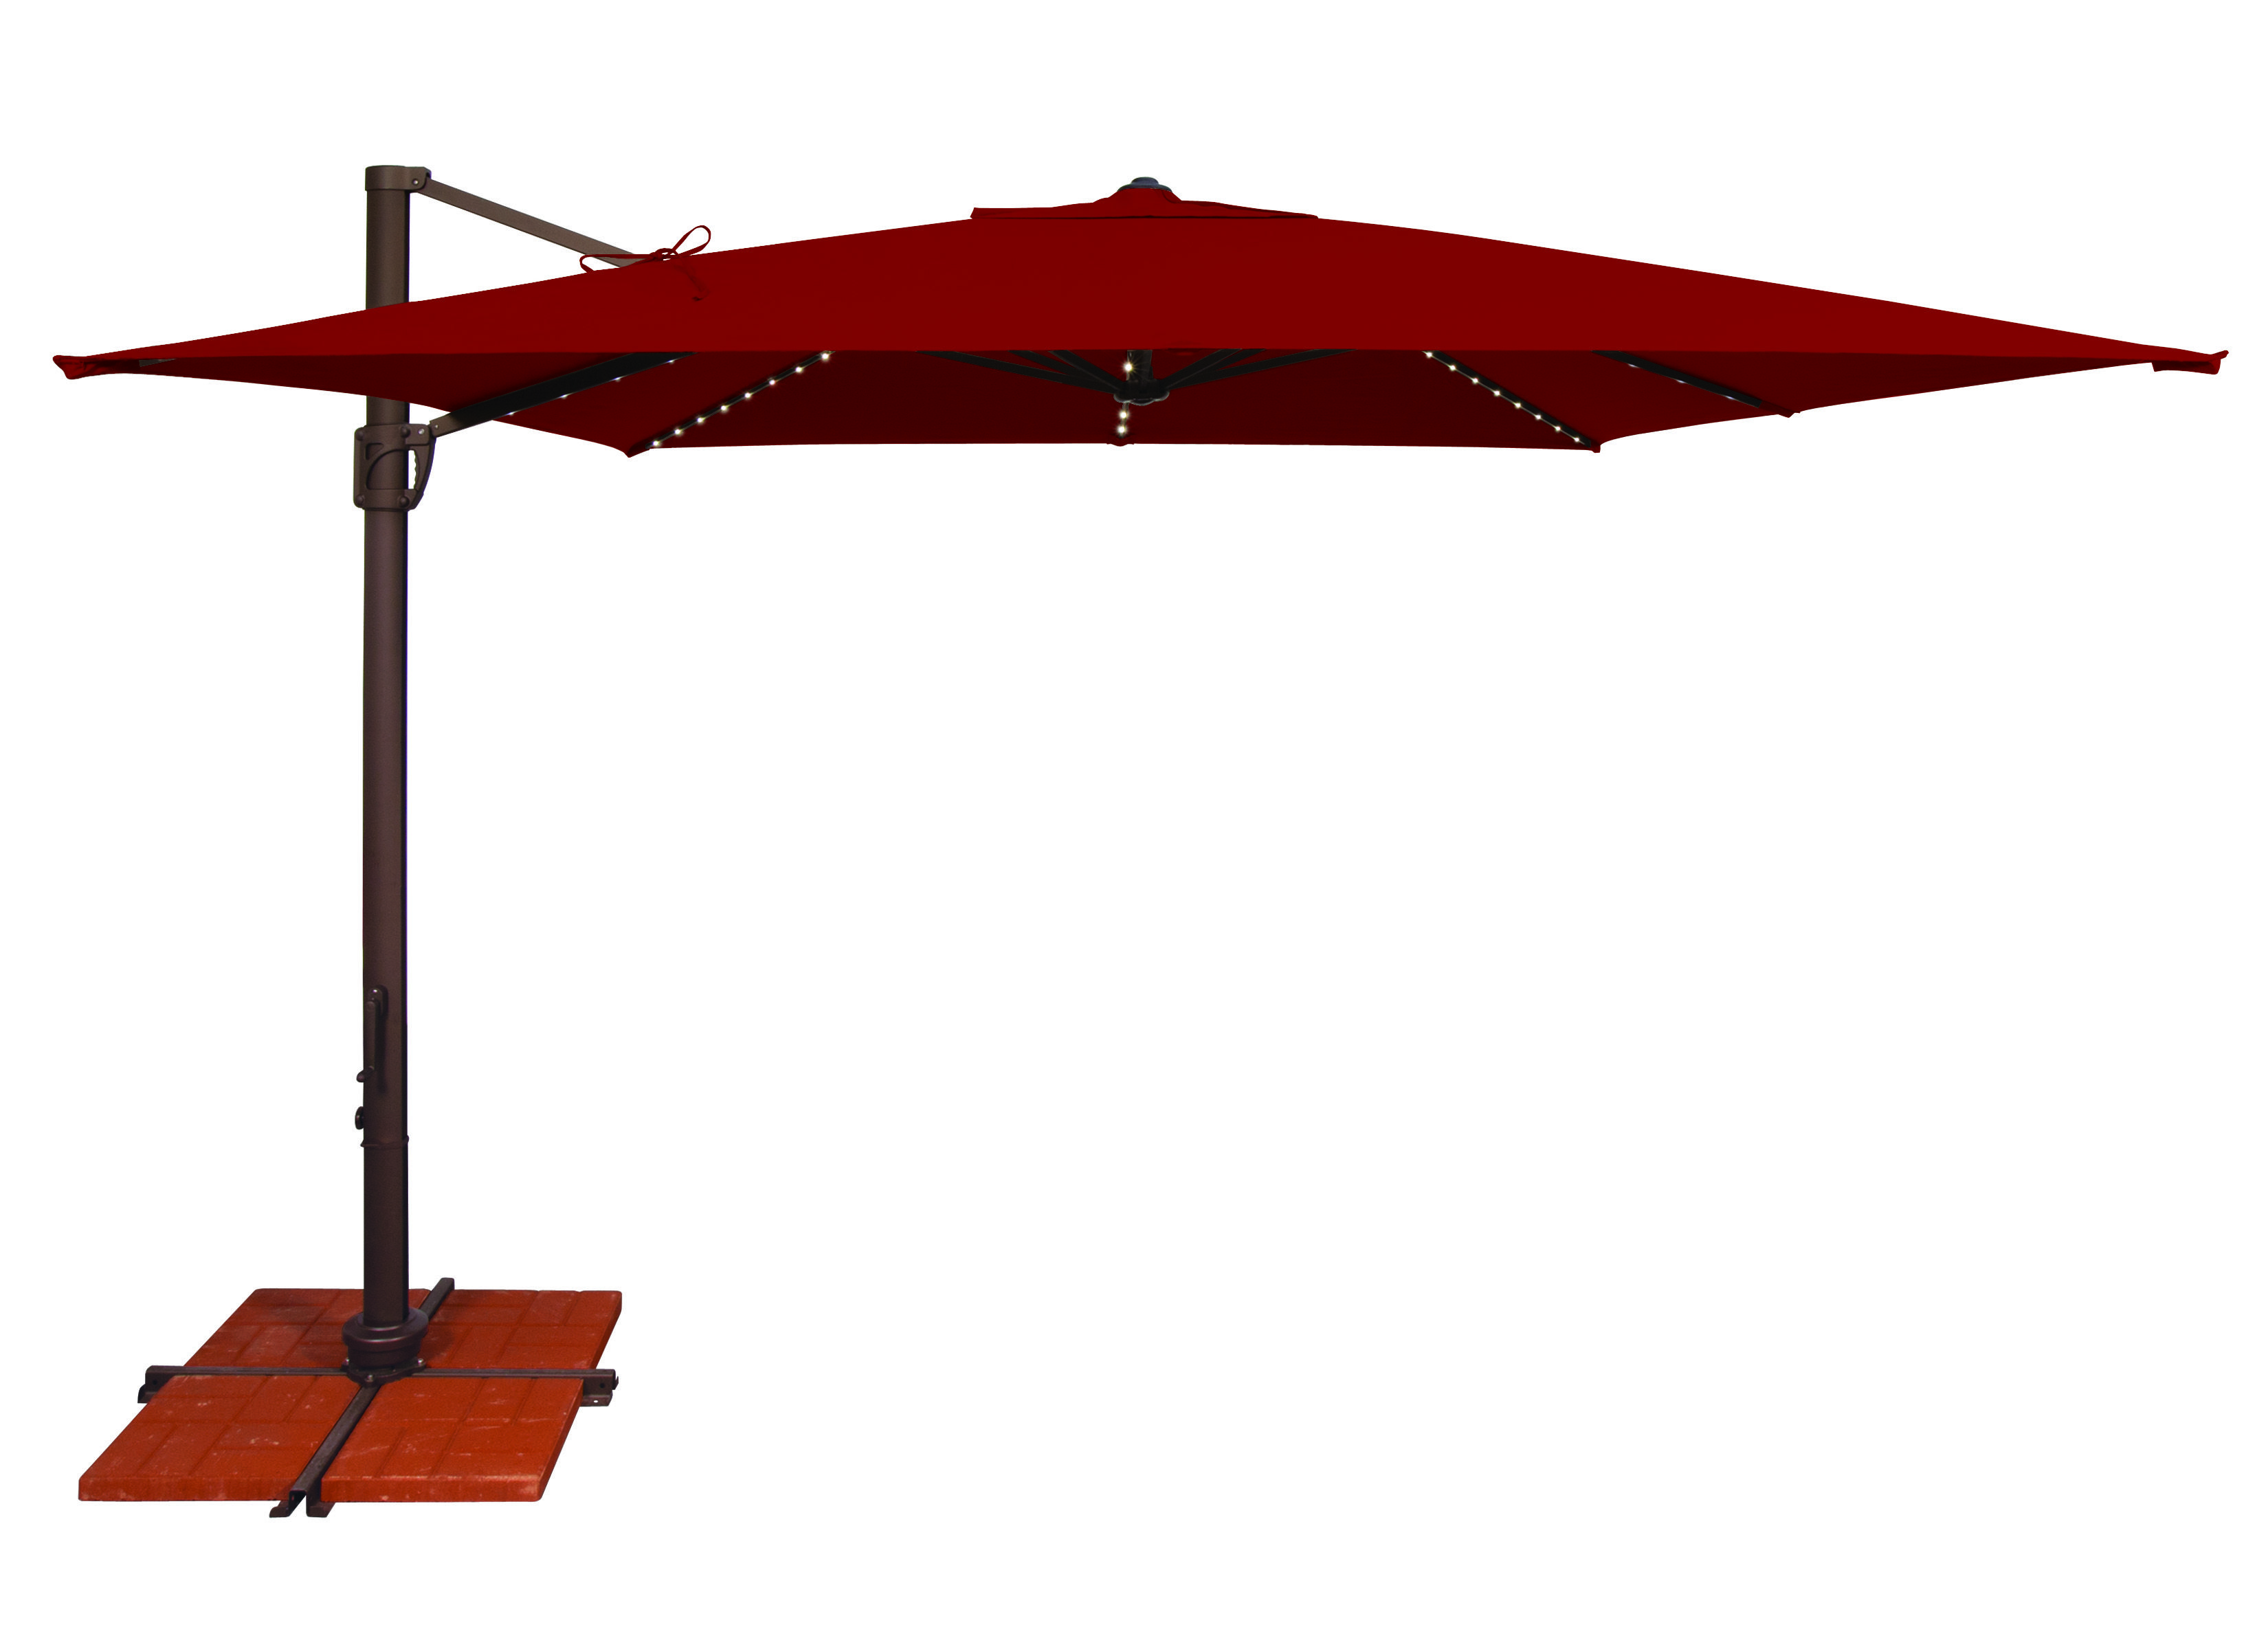 Offset Umbrellas Huge Discounts on Offset Patio Umbrellas u0026 Cantilever Umbrella sale at FactoryDirectPatioUmbrellas.com  sc 1 st  Pinterest & Offset Umbrellas Huge Discounts on Offset Patio Umbrellas ...